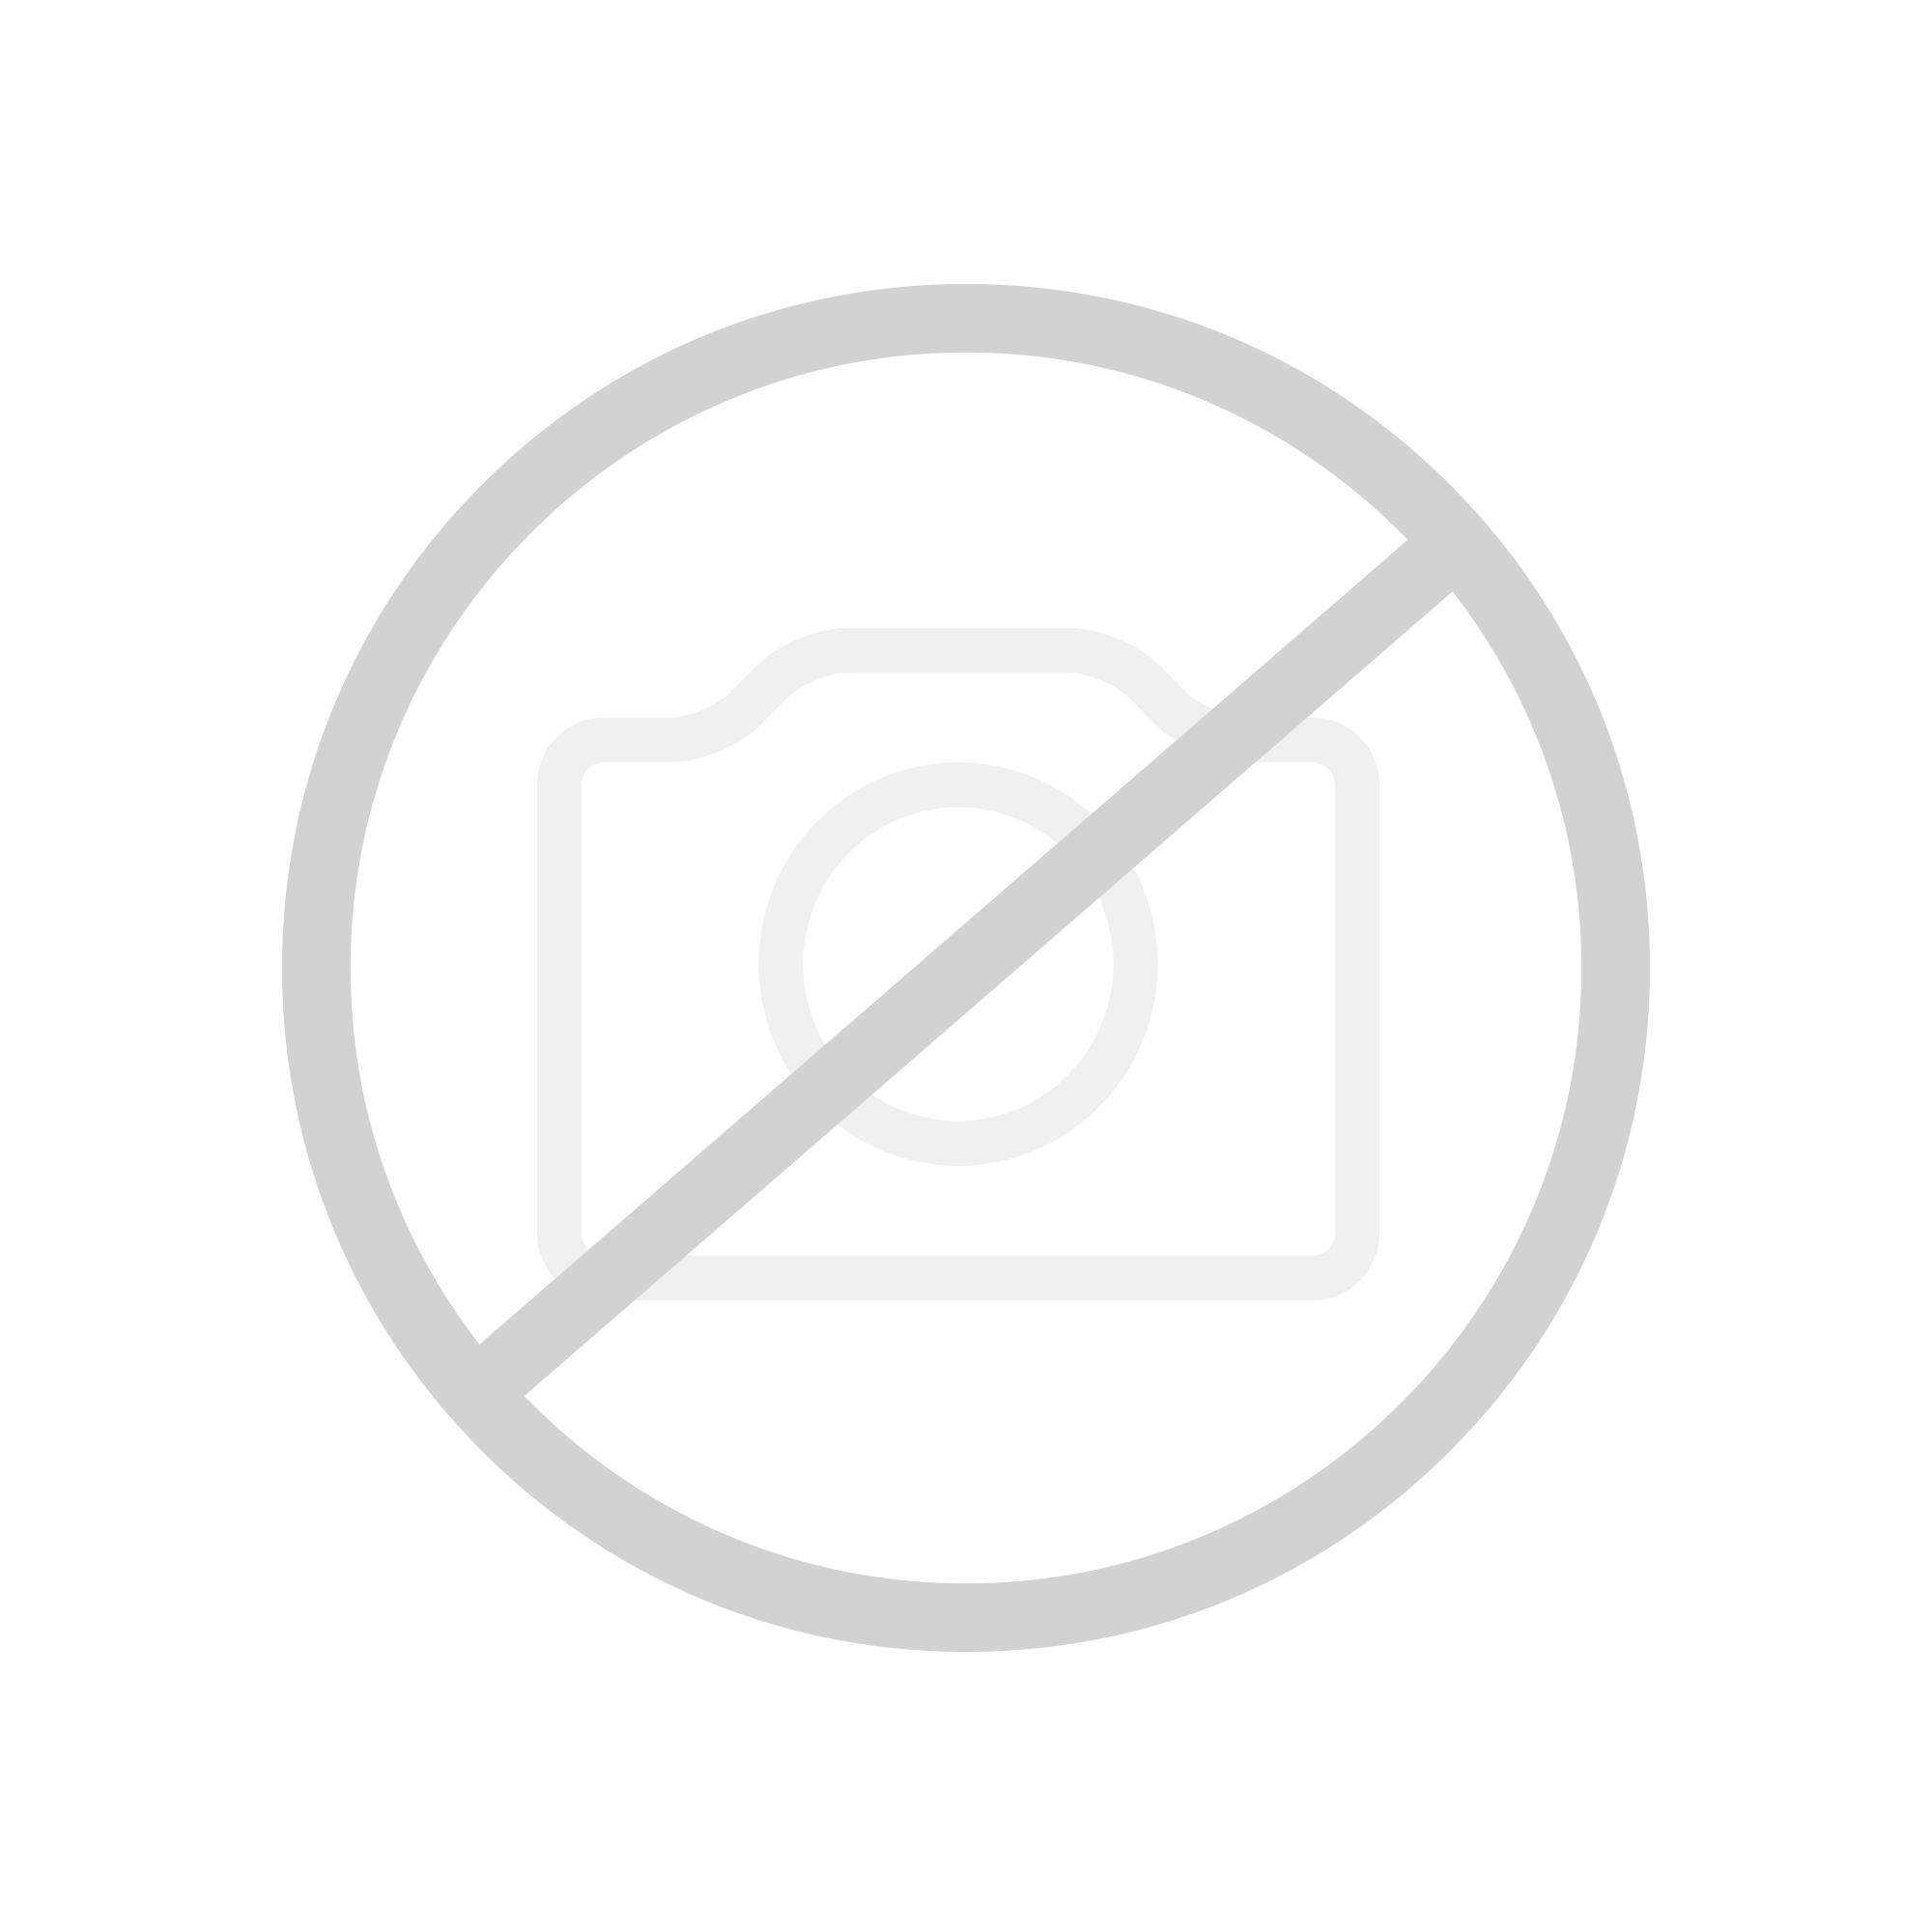 Wandheizkörper: So schön sind Vertikalheizkörper | REUTER Magazin